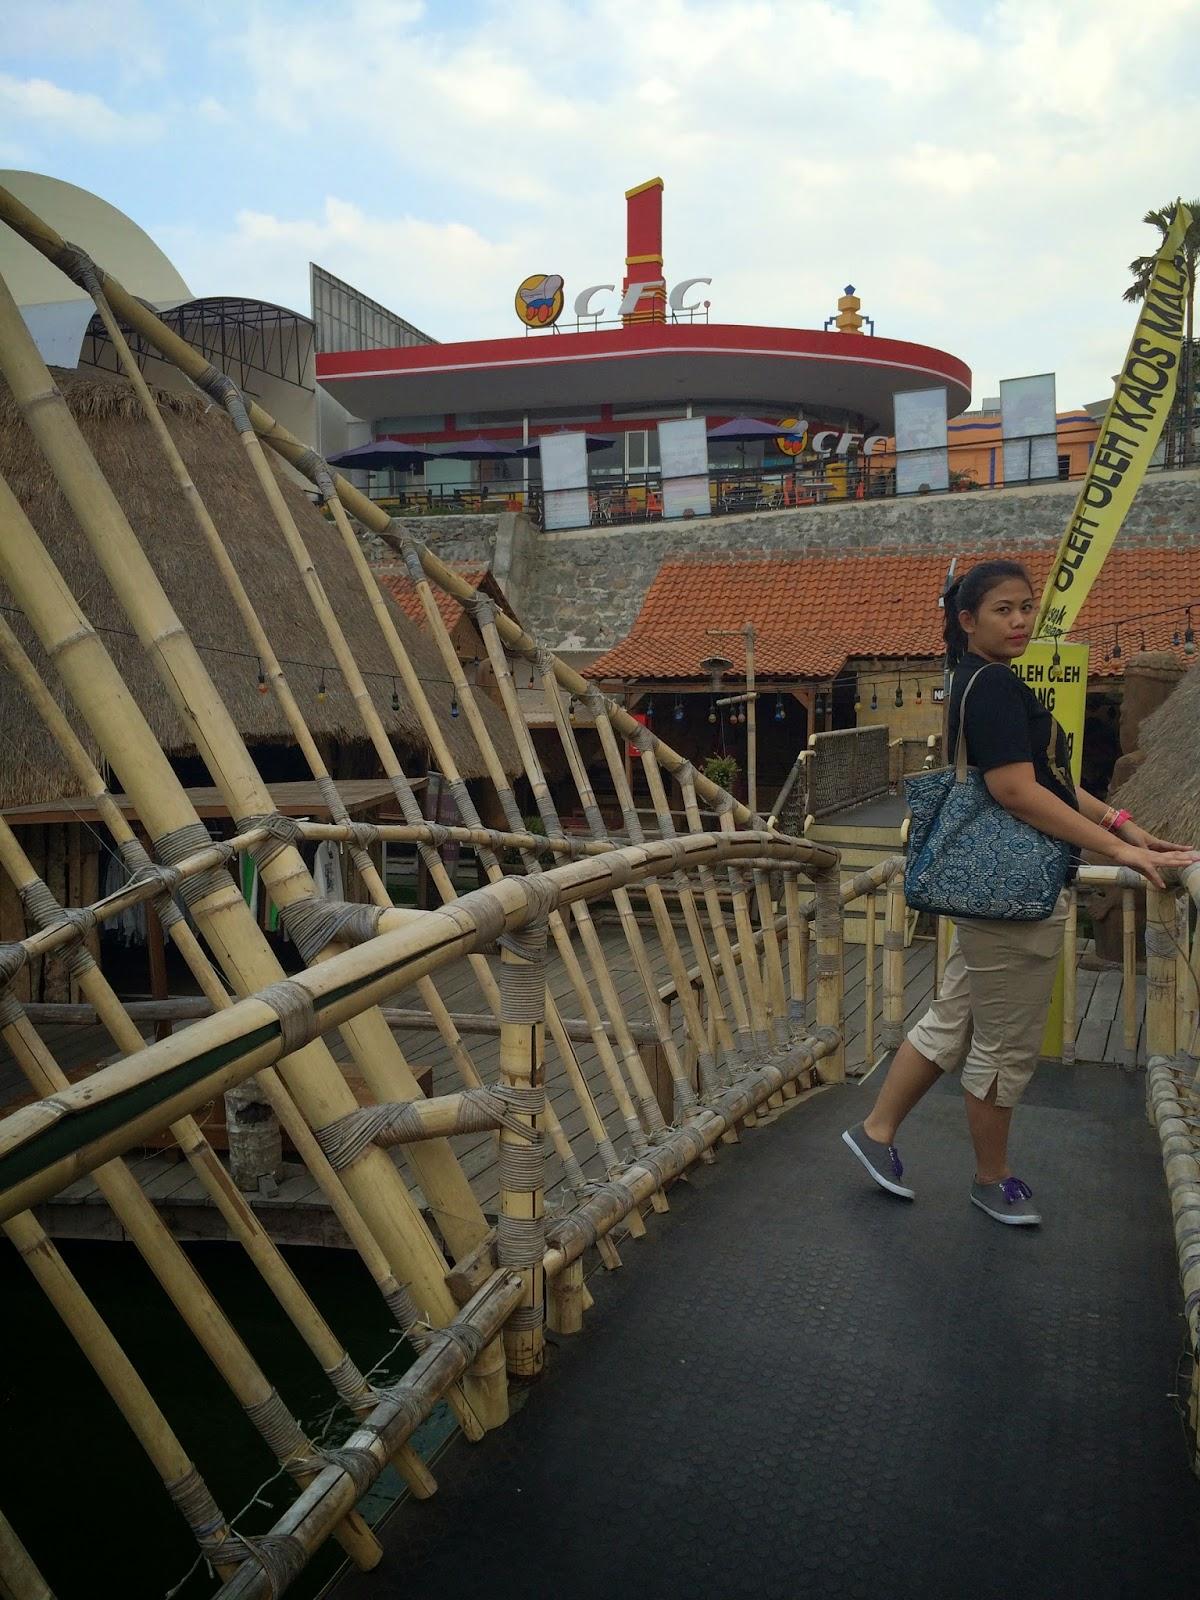 Wisataprisca Kulinerprisca Wisata Kota Malang Batu Jawa Timur Walopun Kecil